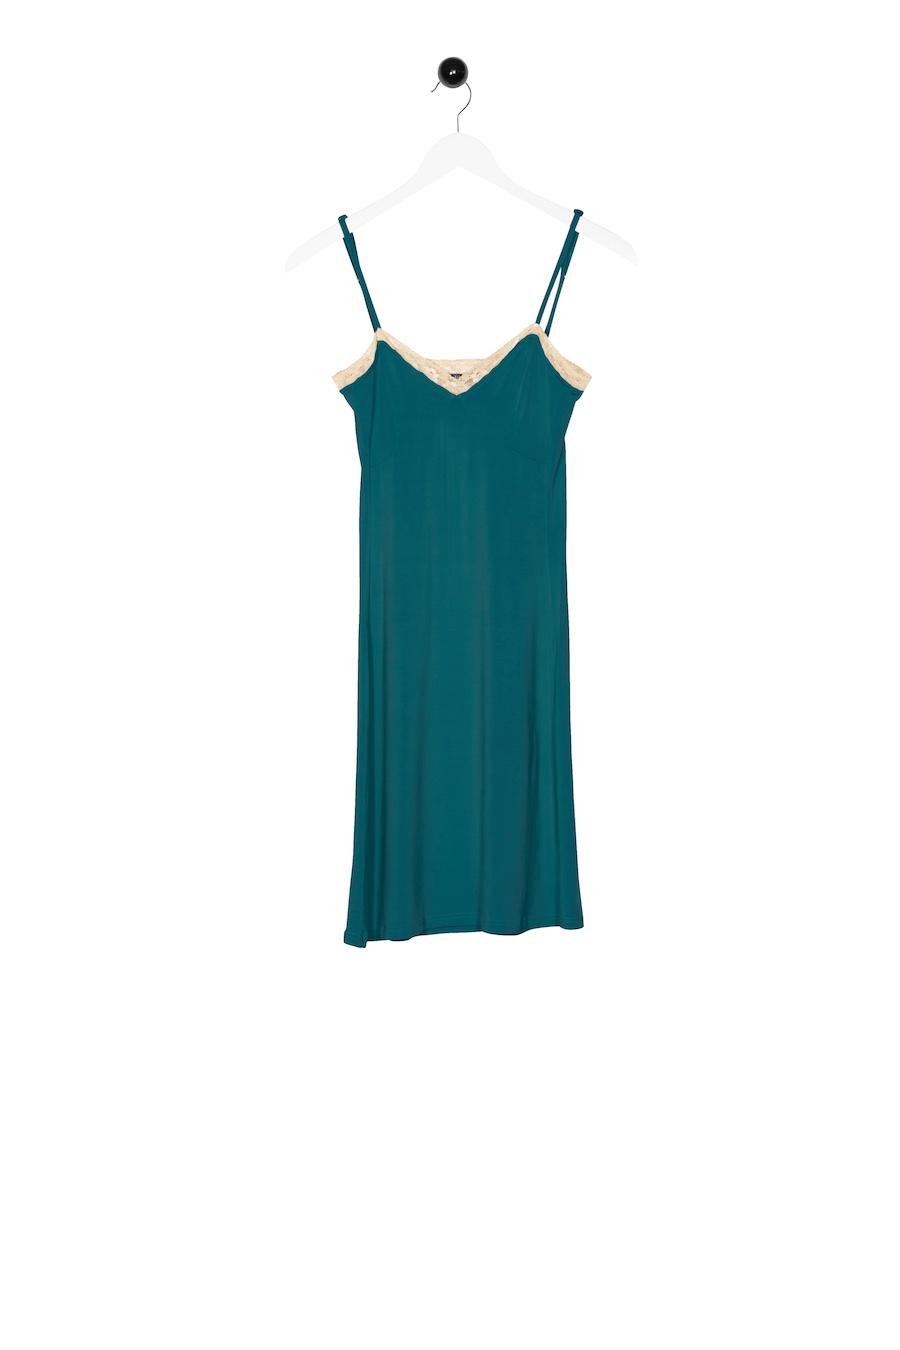 U-w Dress